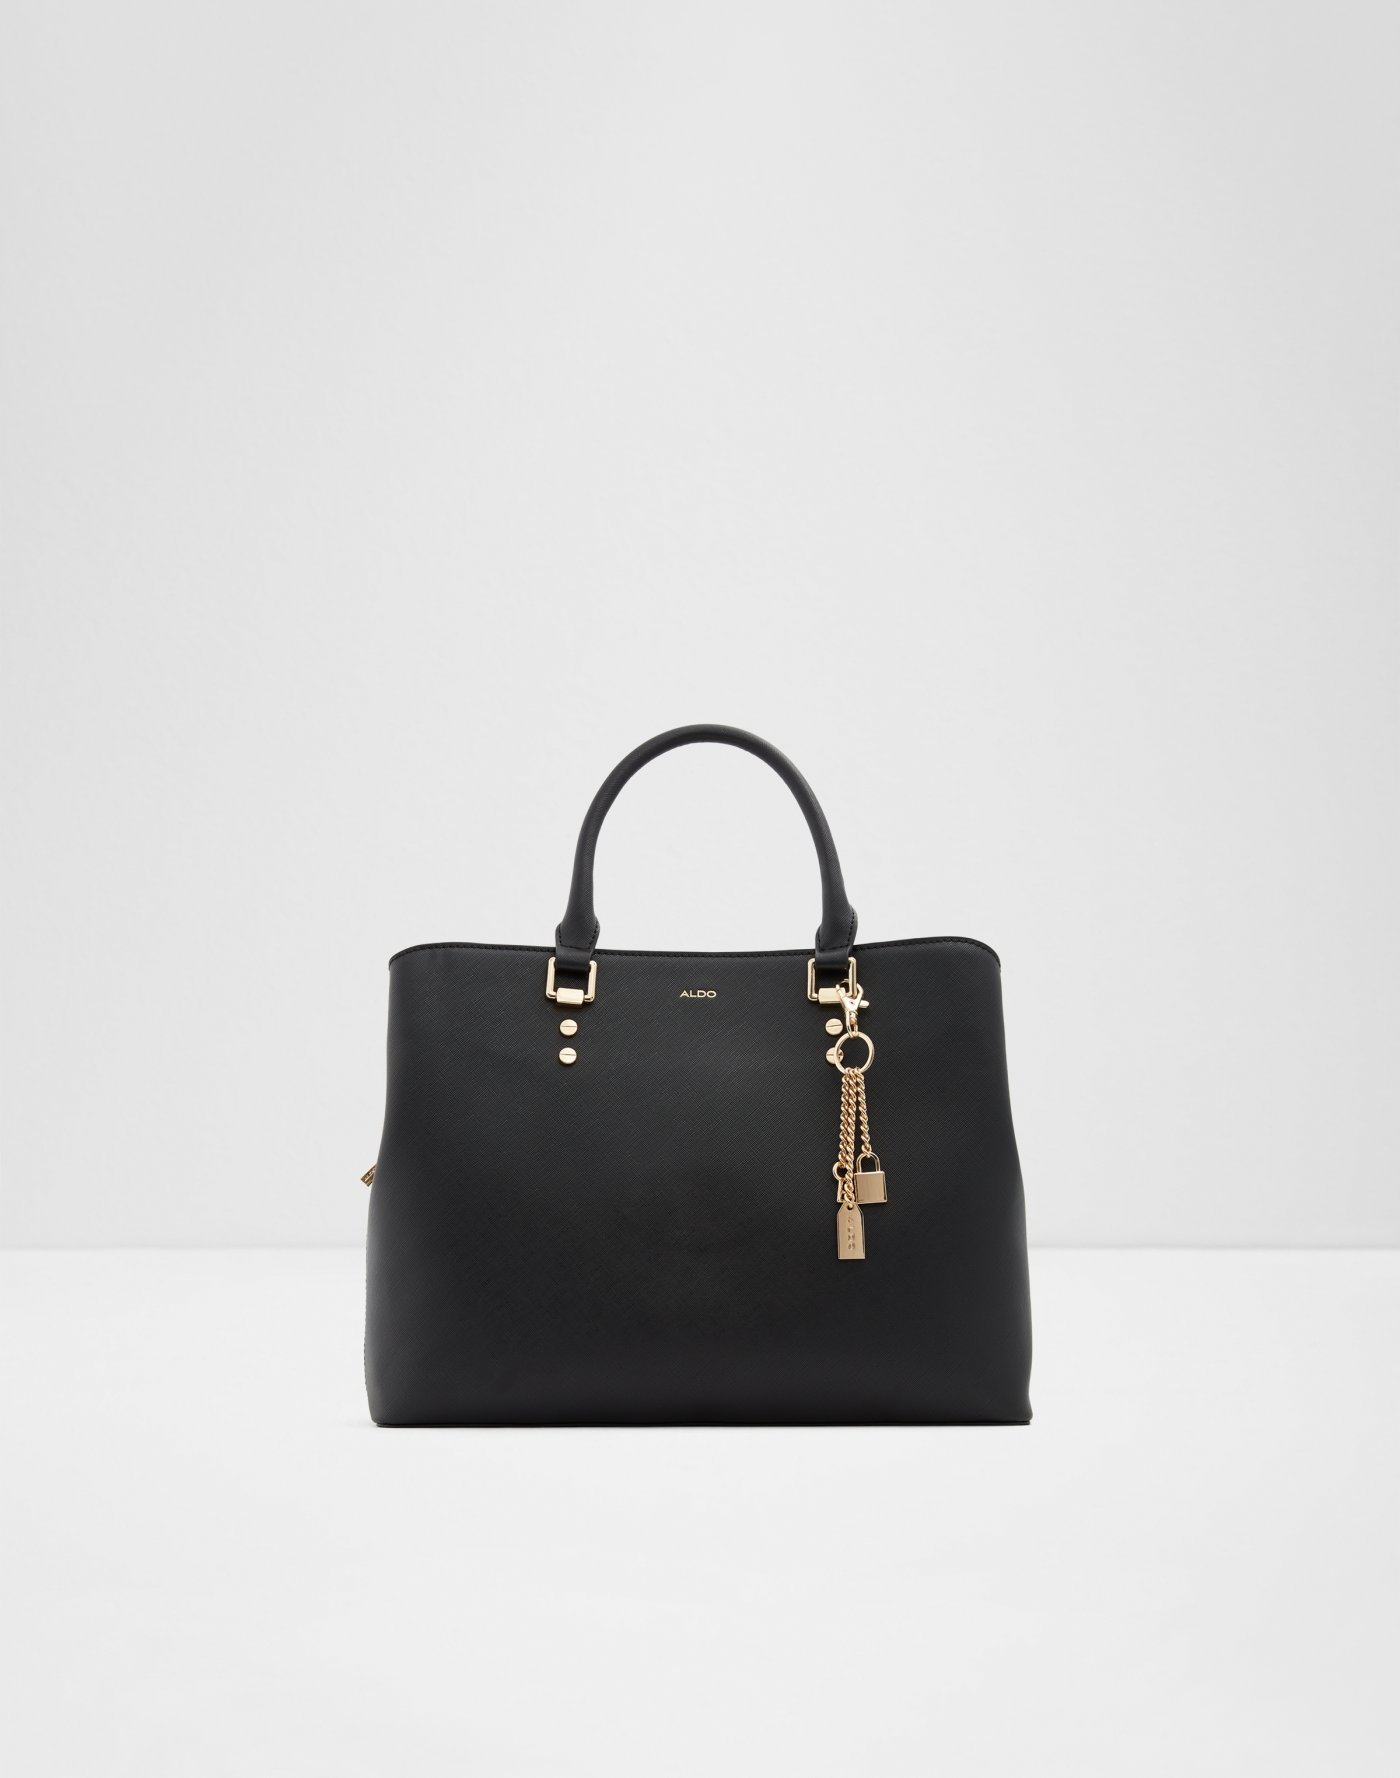 05679b6991d0 All Handbags | Aldoshoes.com US